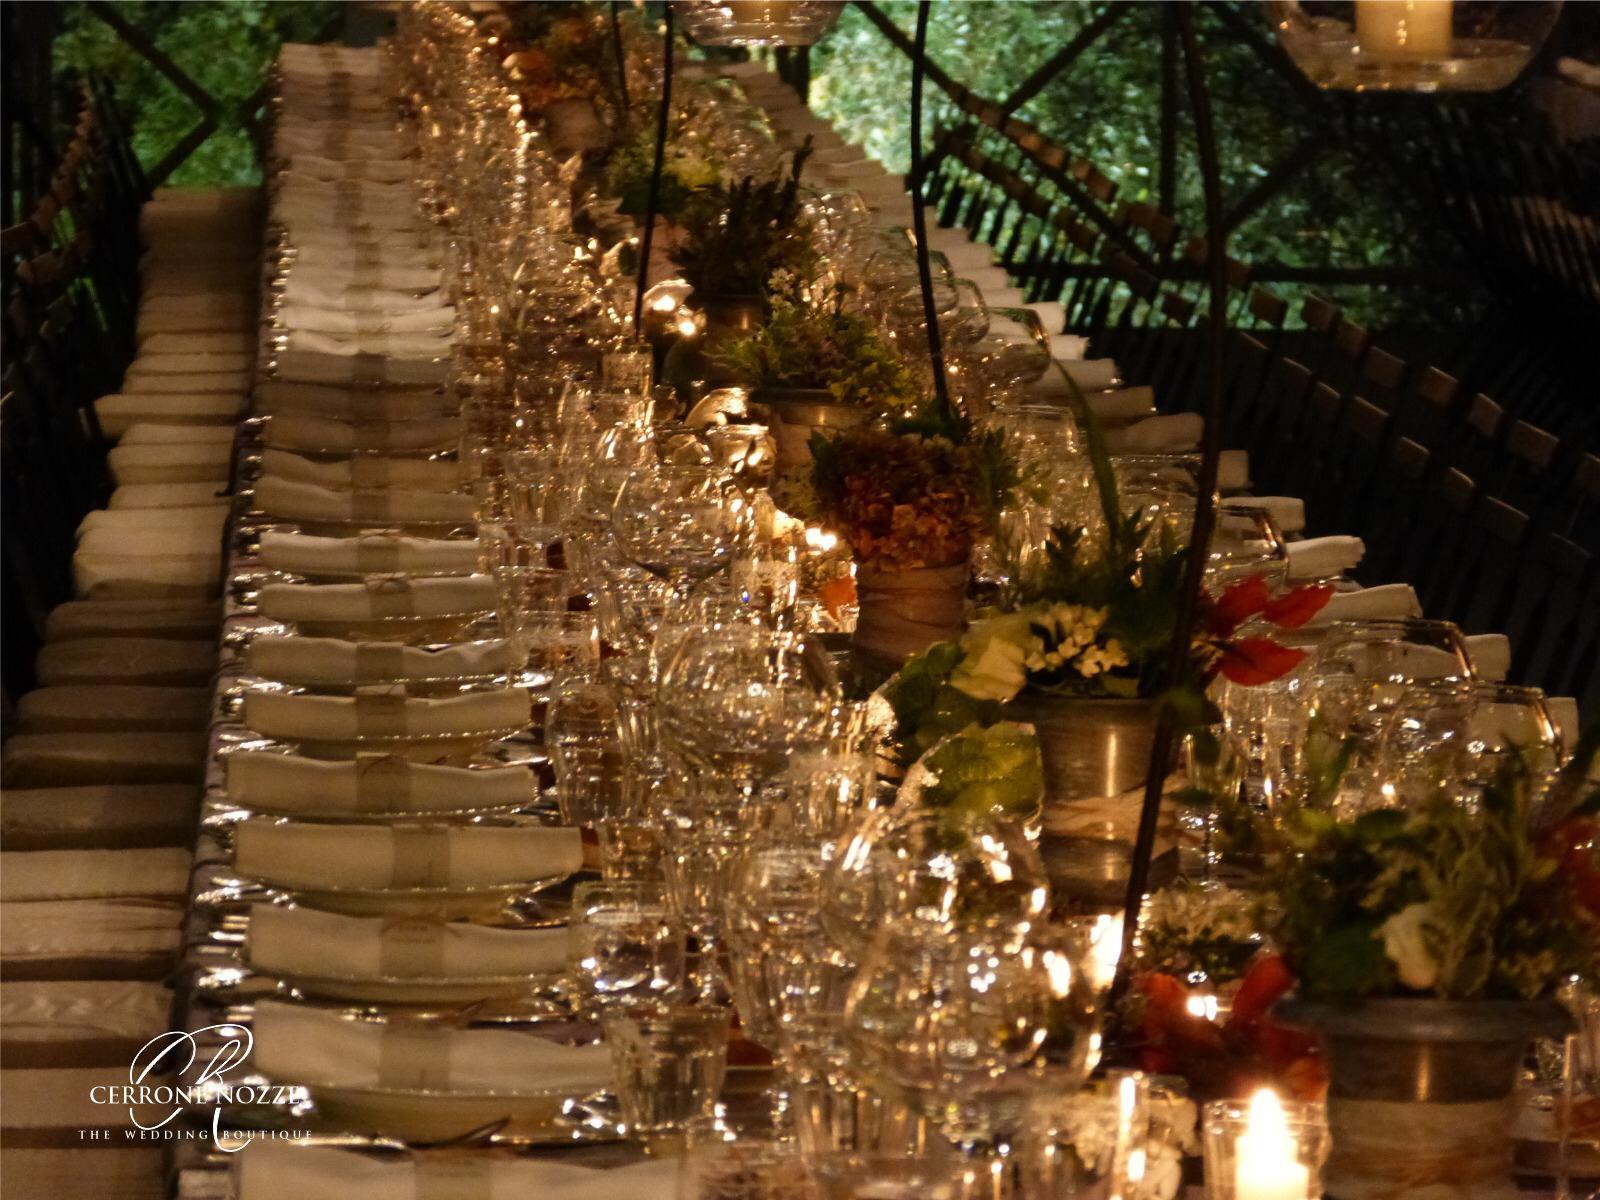 Wedding Sationery matrimonio shabby country   Cerrone Nozze Wedding Boutique